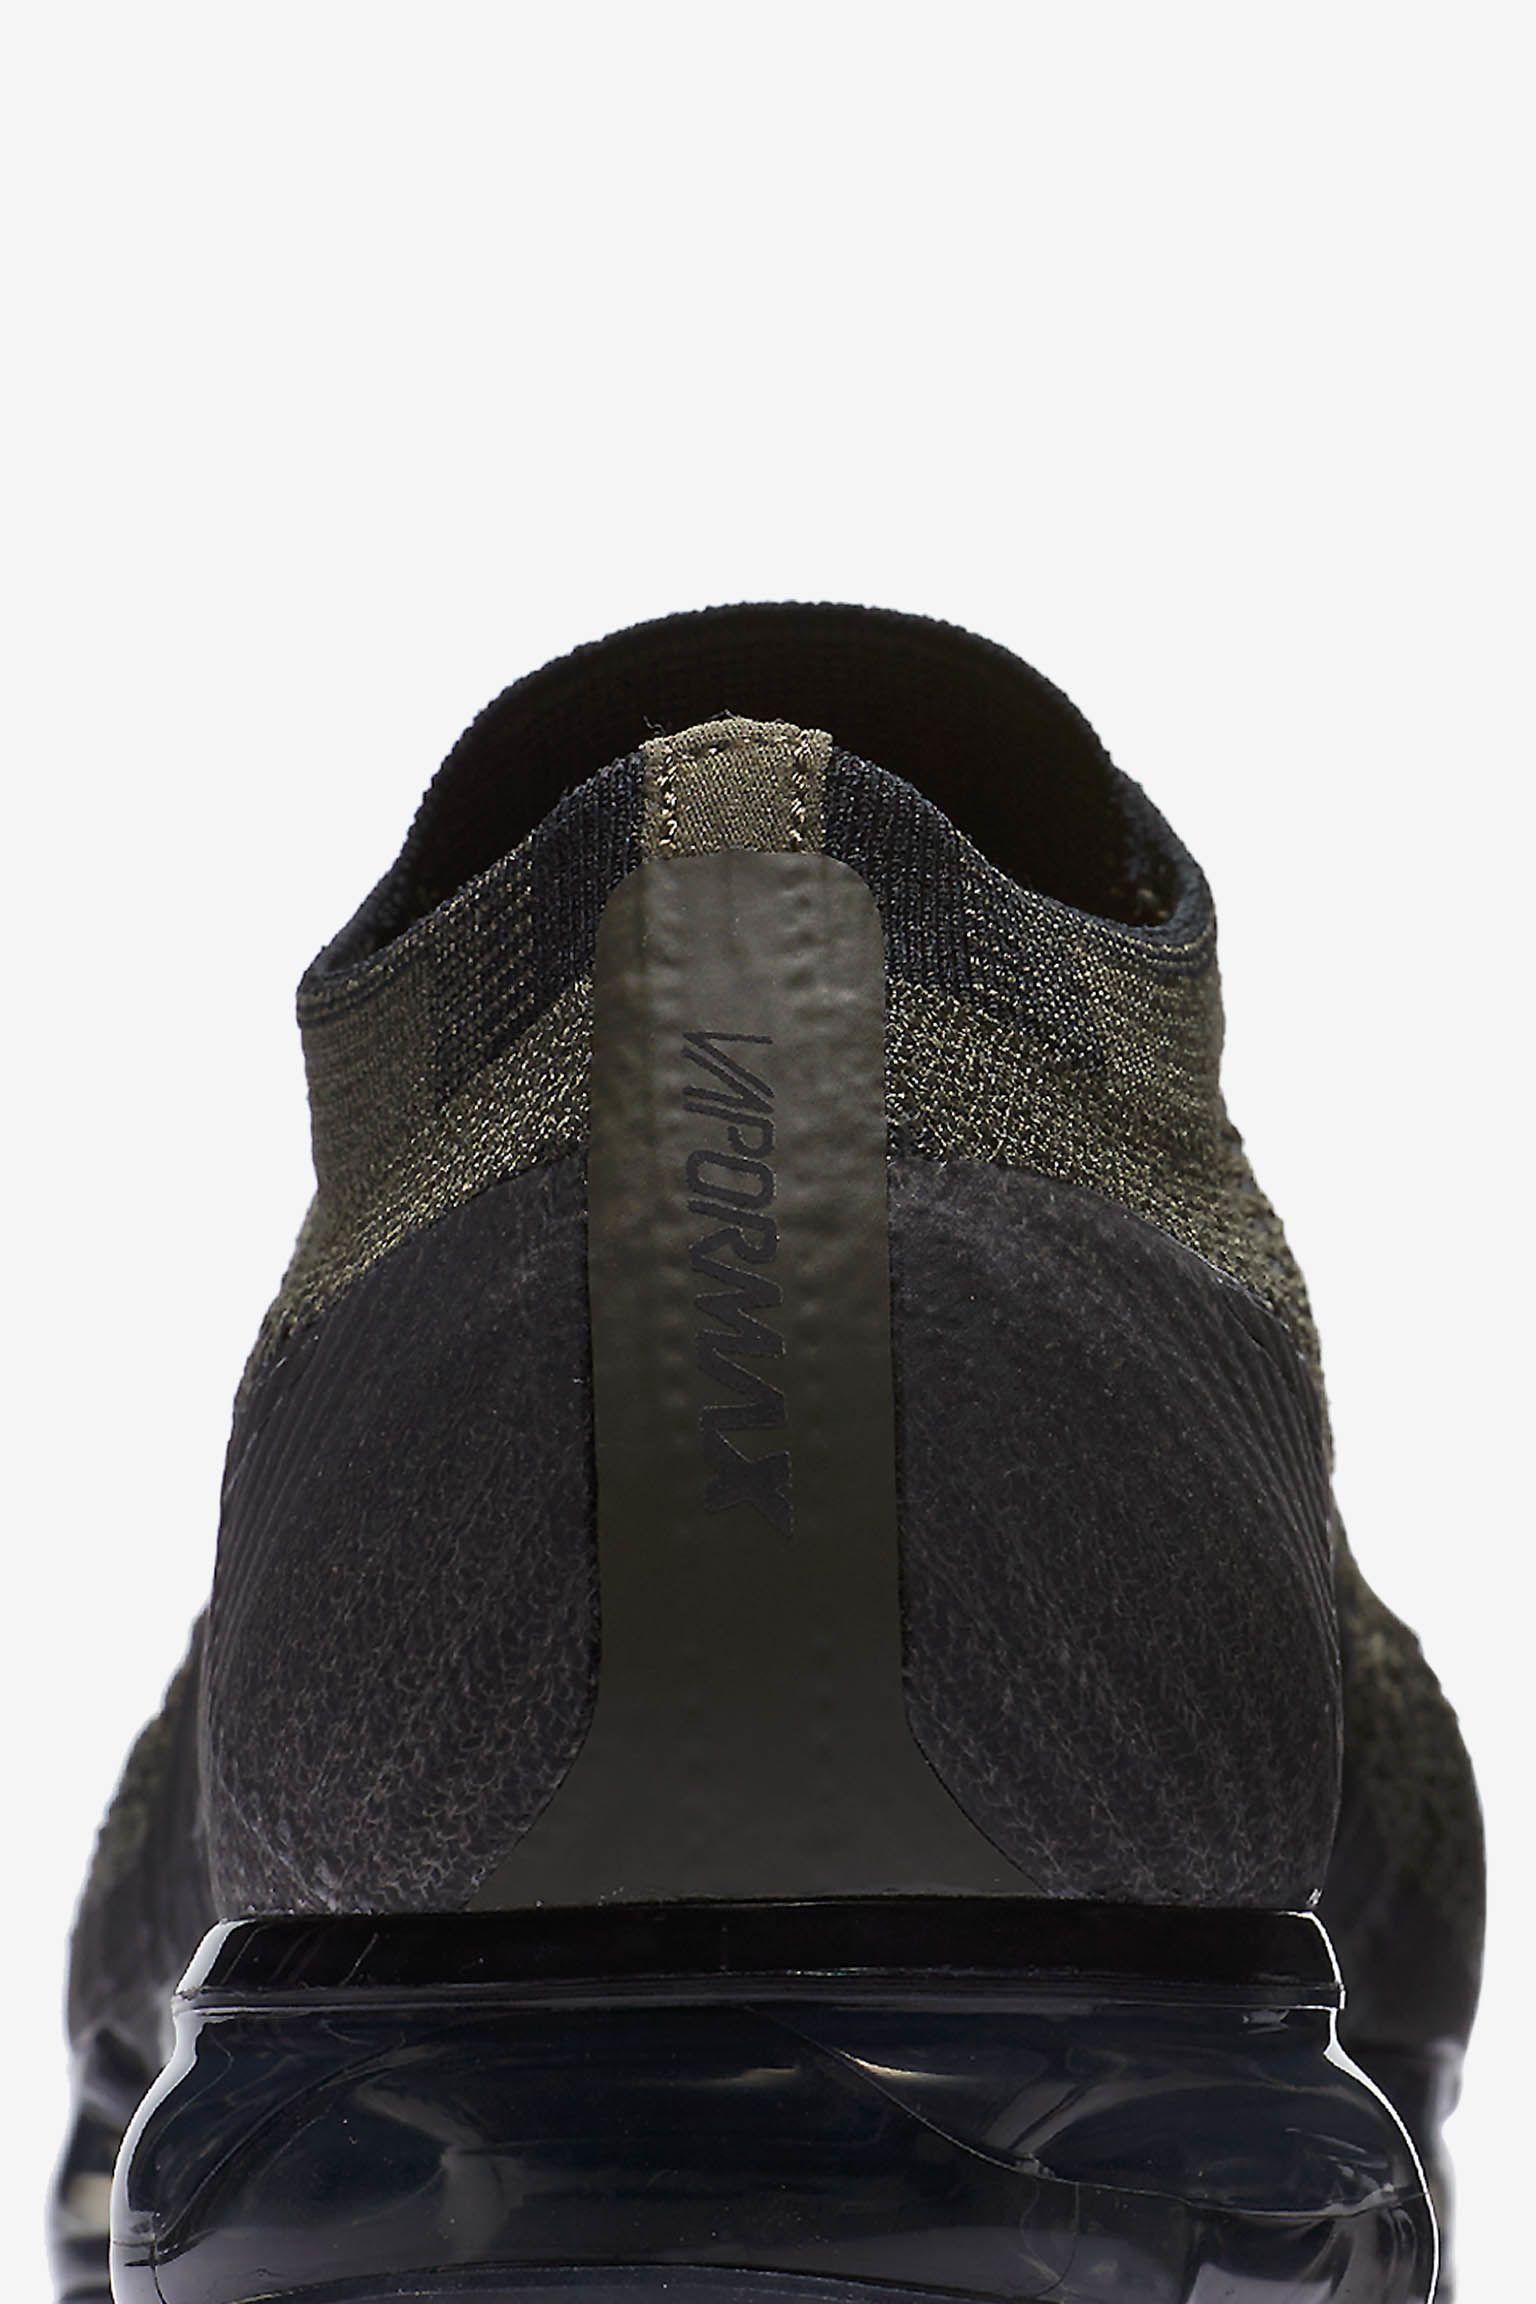 Sortie De La Date Khaki Vapormax Nike Black amp; Air « Cargo 5177Ax